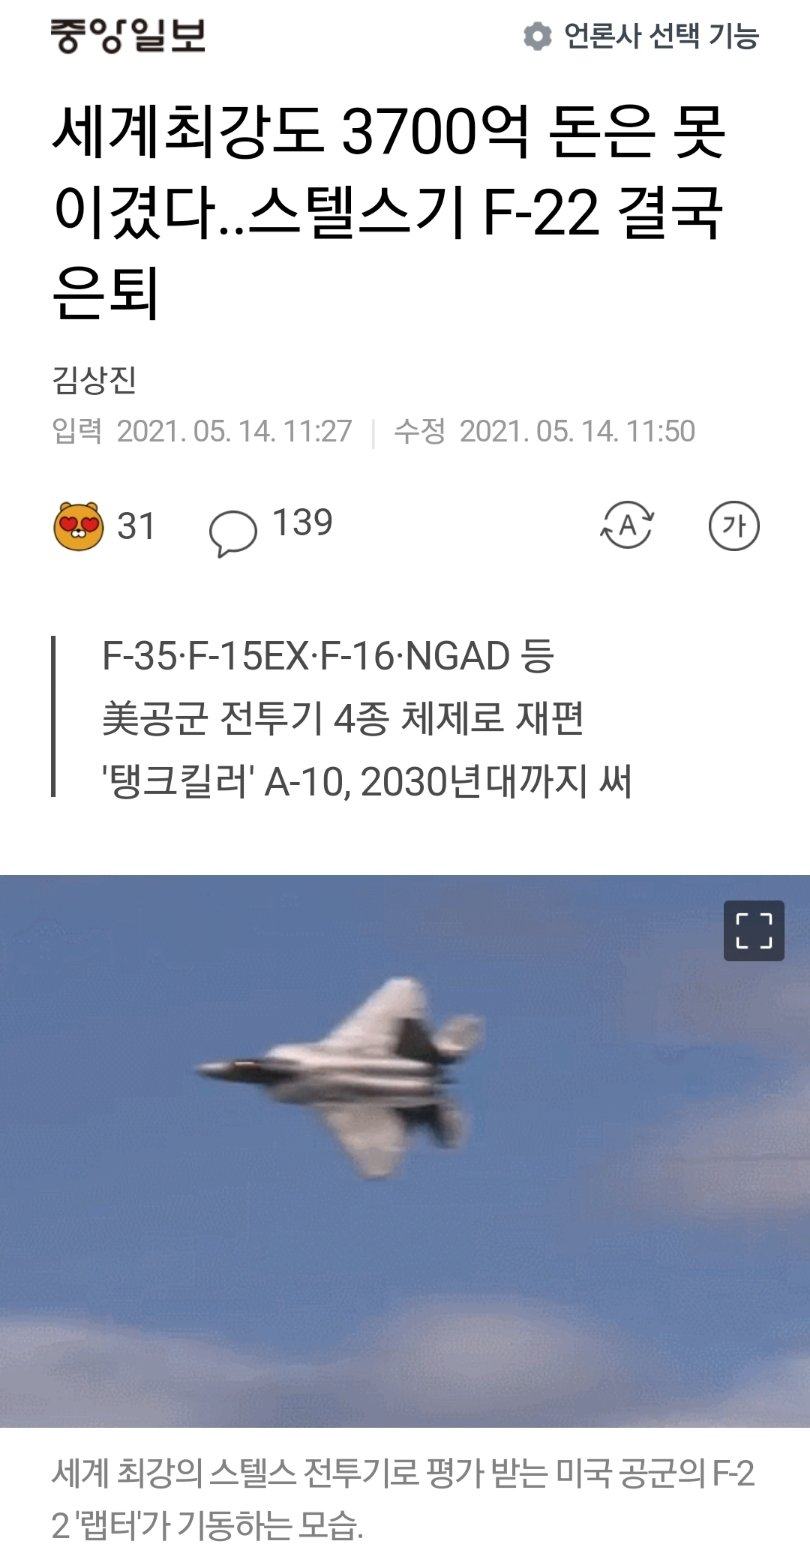 viewimage.php?id=3abcc2&no=24b0d769e1d32ca73dec8efa11d02831b210072811d995369f4ff09c9cd54d8754c010129771a8dac966472d91d8ea4e7e5789ca30695fe393229ebd76d0eda2ab3878a1494458020dc11bbcee93934328c31d4ce926b3cea3fa